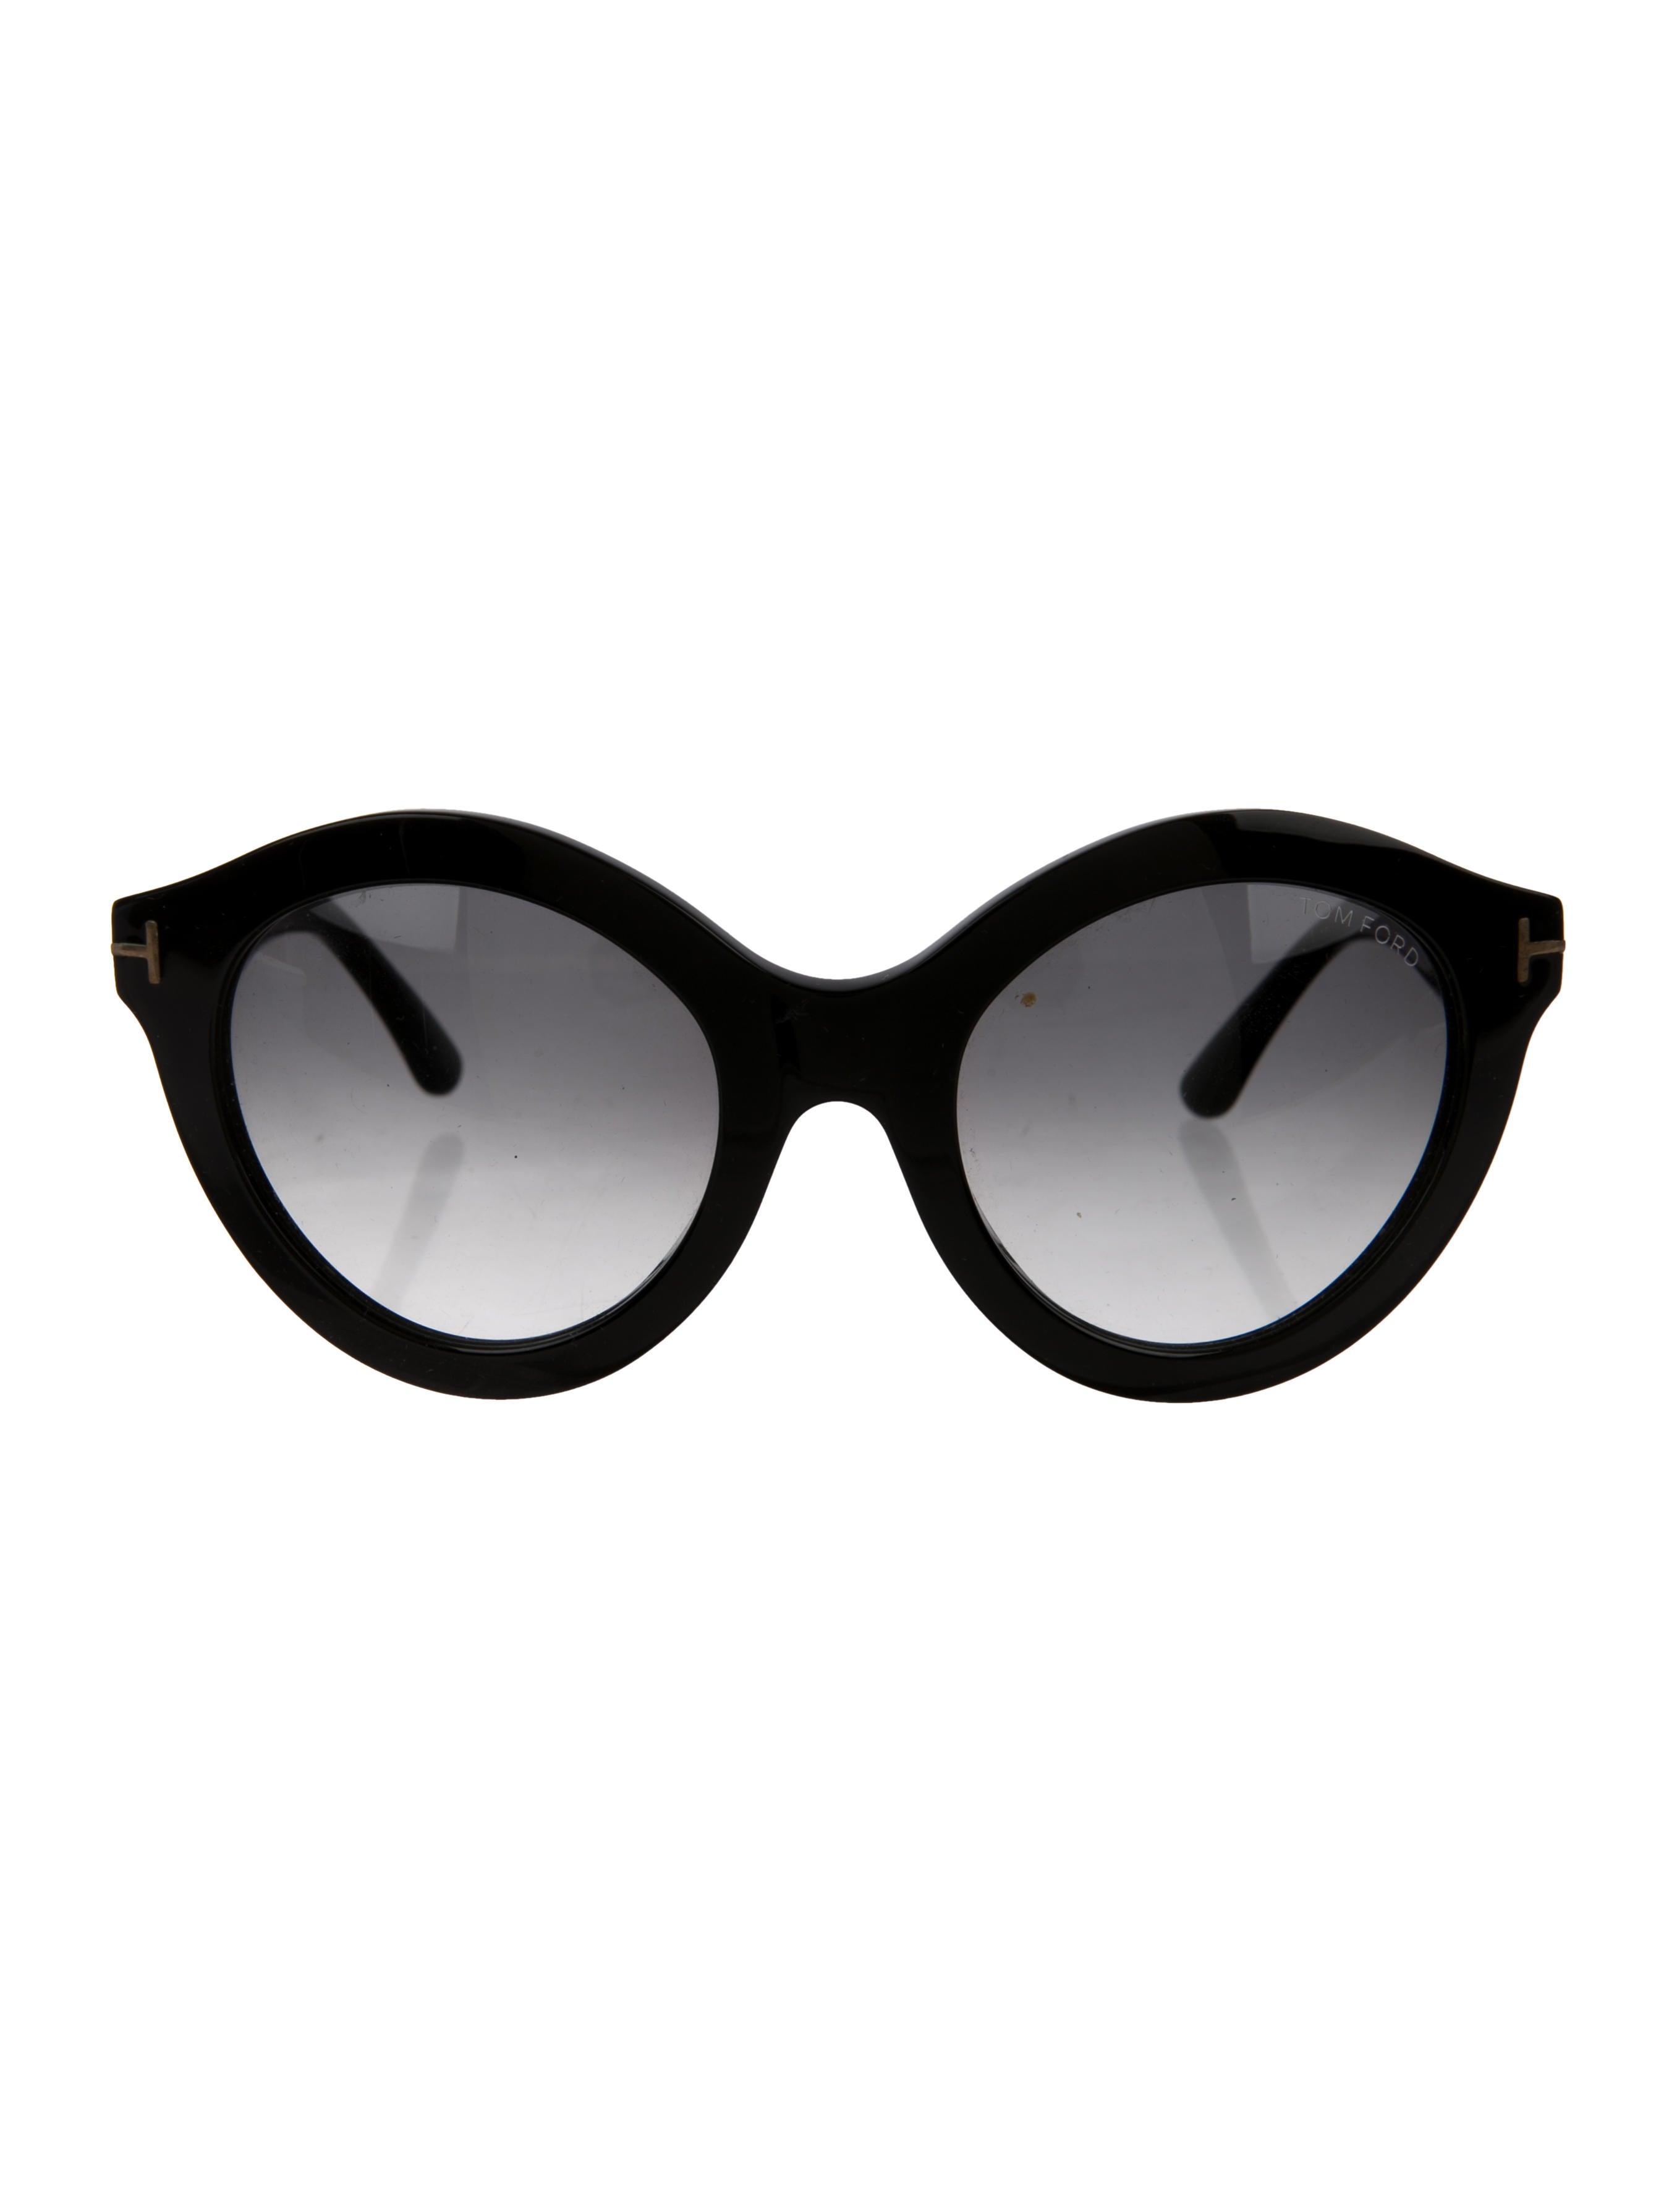 18dc8e09906c Tom Ford Chiara Oversize Sunglasses - Accessories - TOM46319